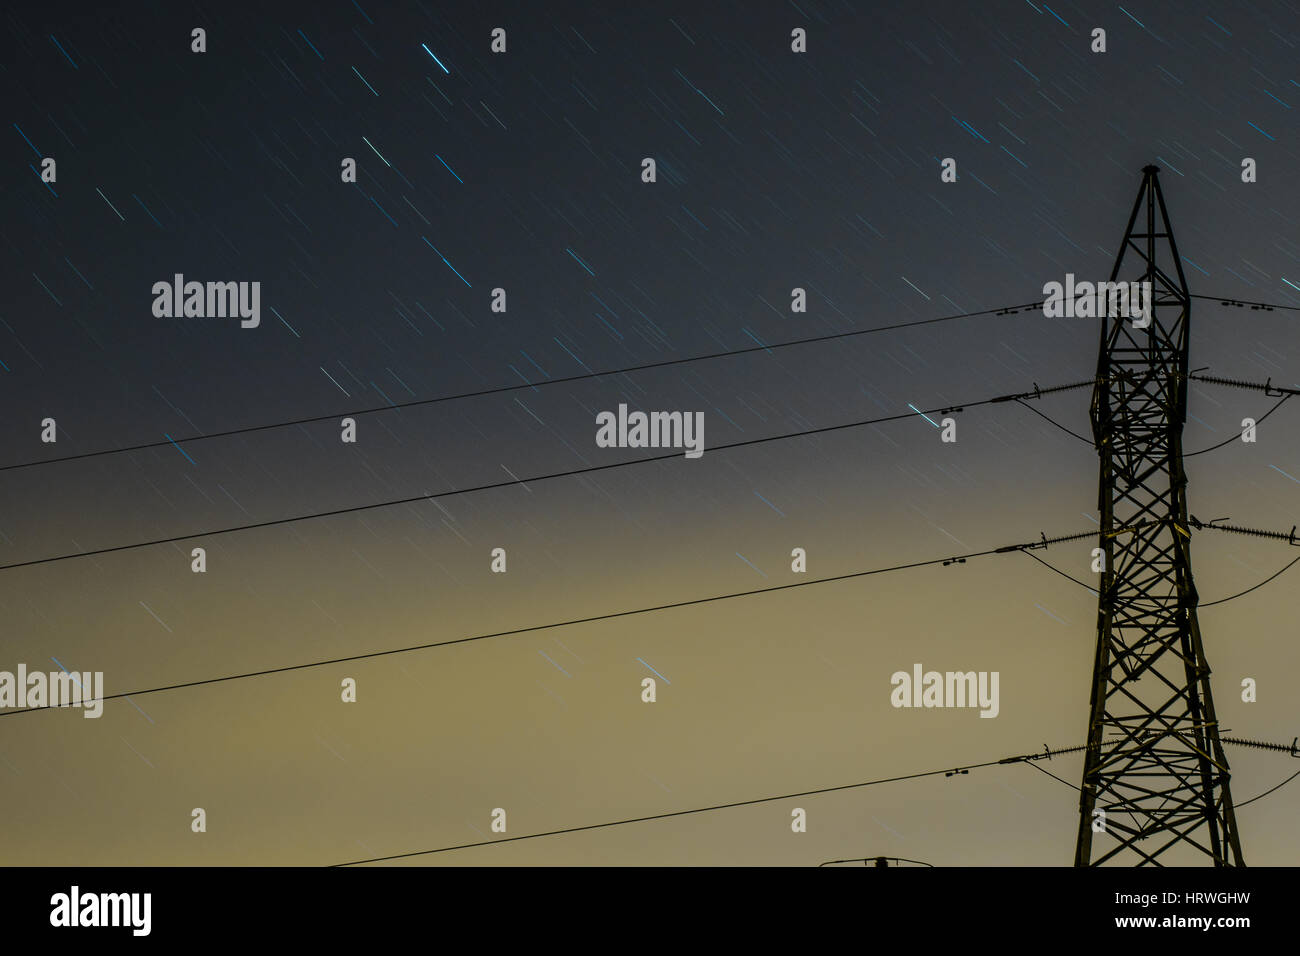 stary night - Stock Image